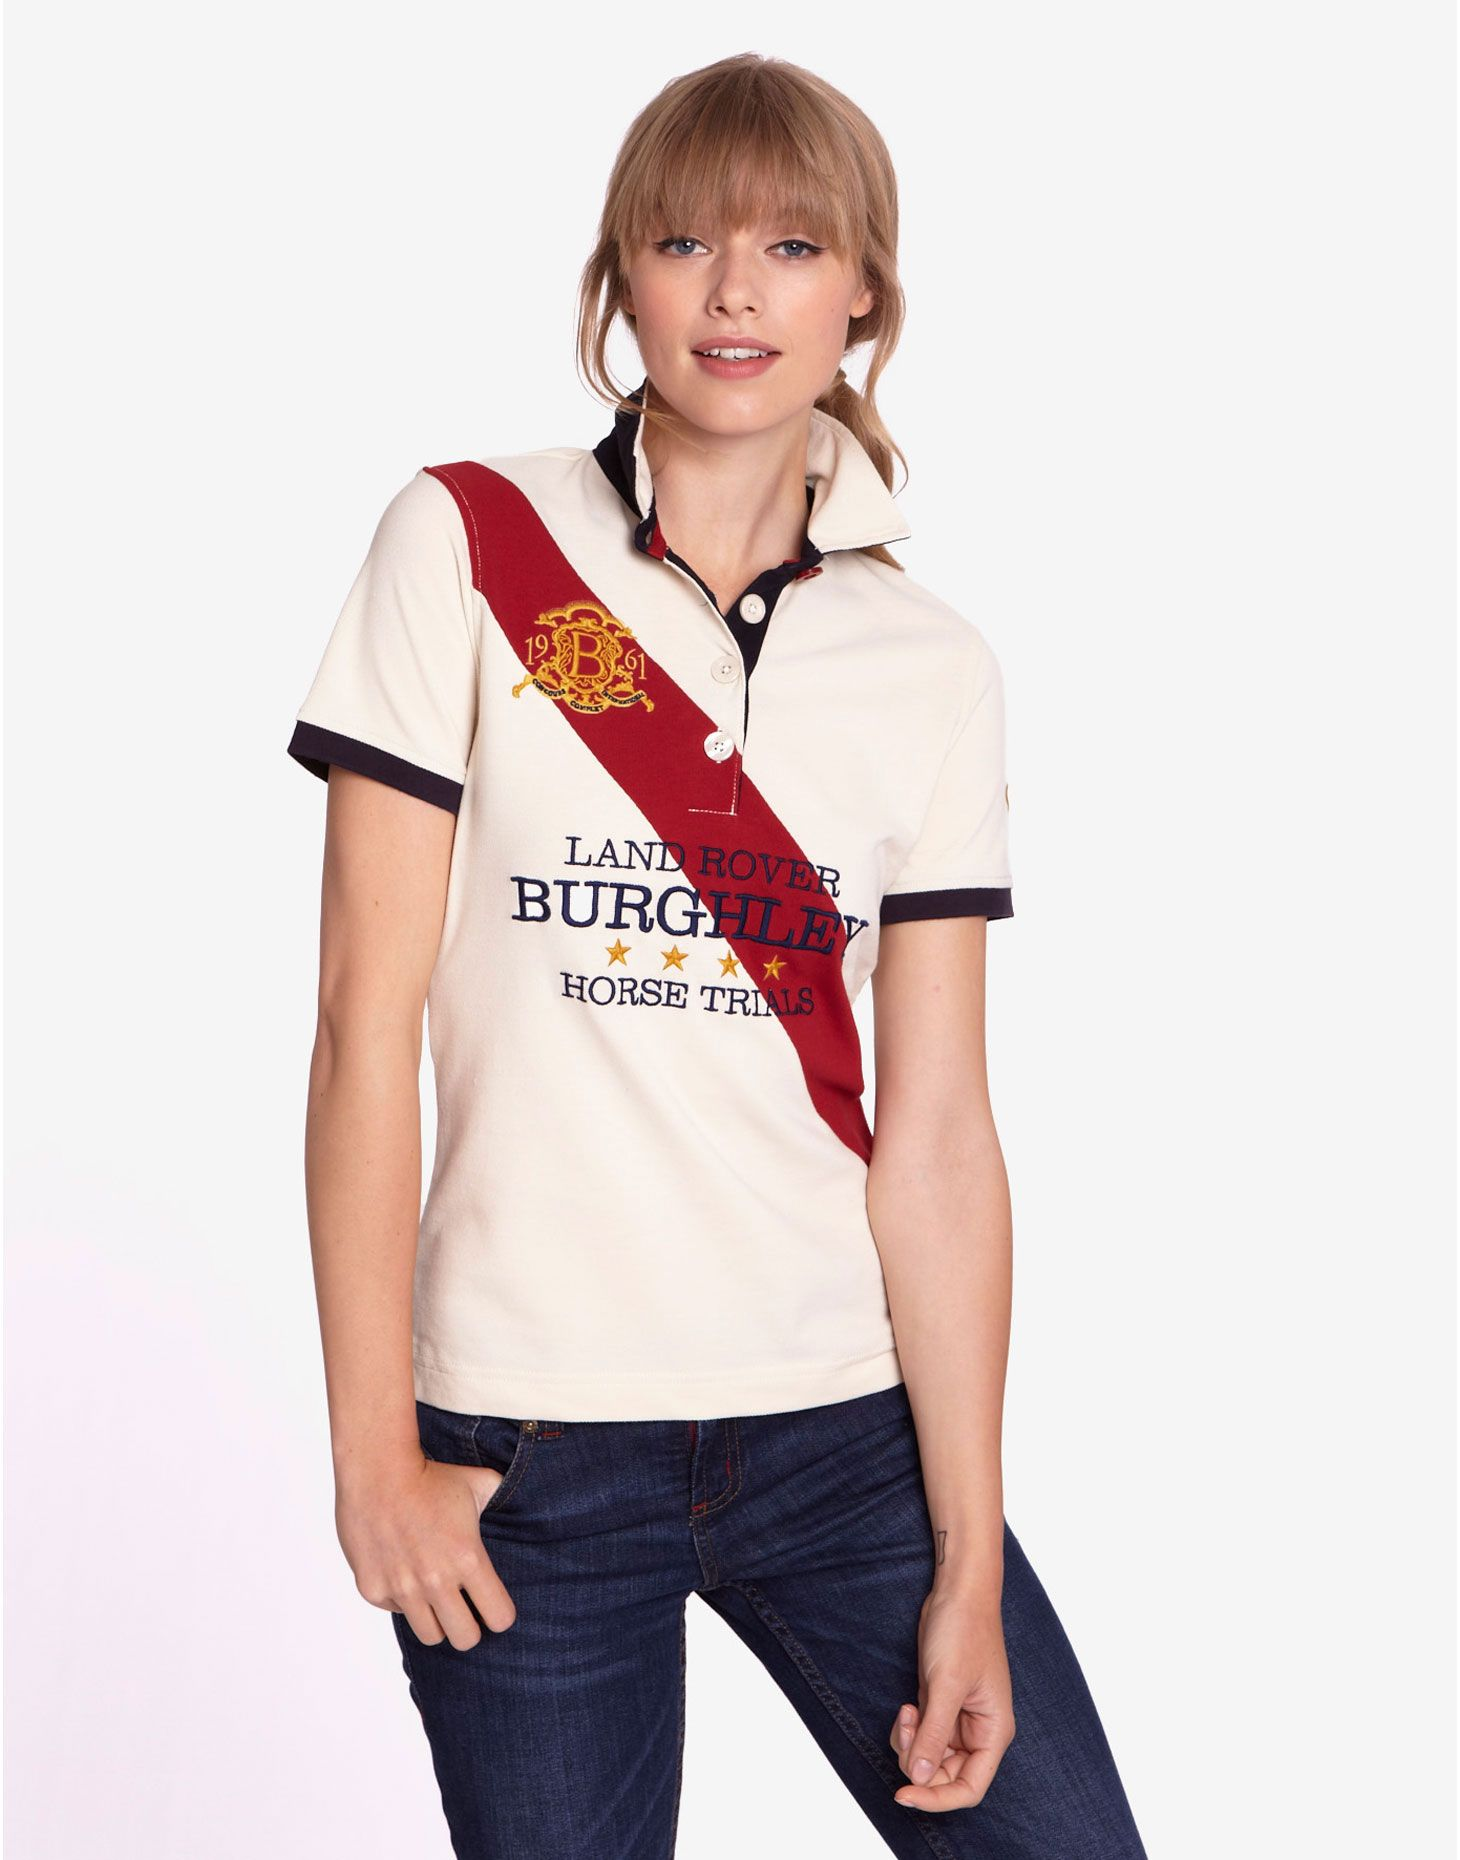 Womens Equestrian Polo Shirts Uk